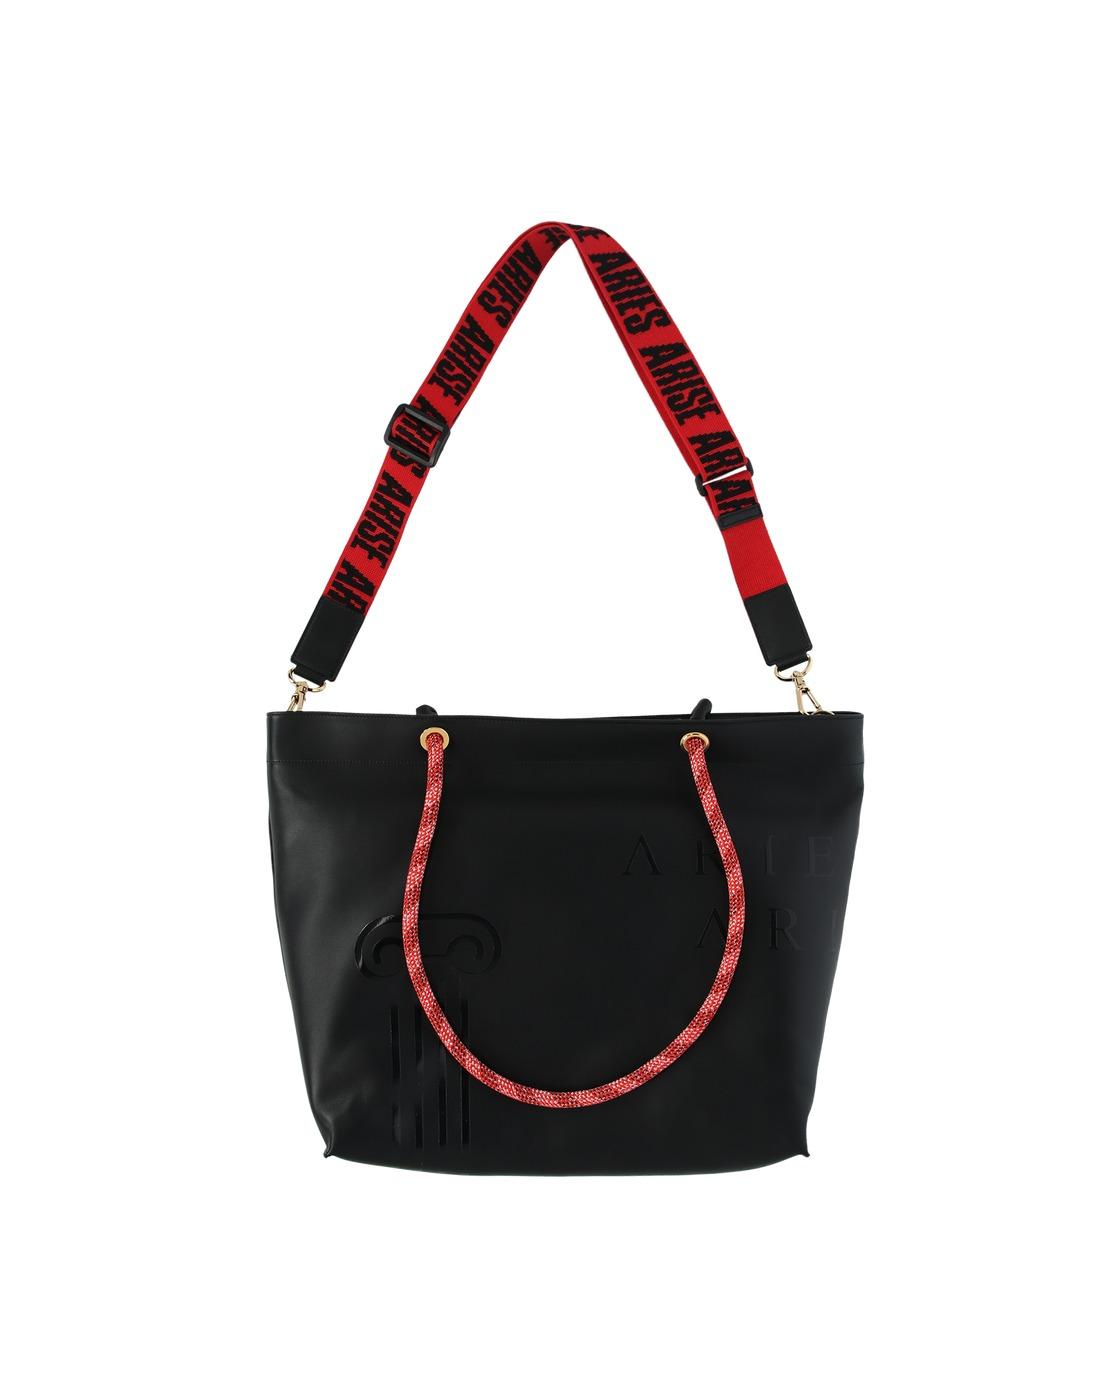 Aries Leather Shopper Bag Black